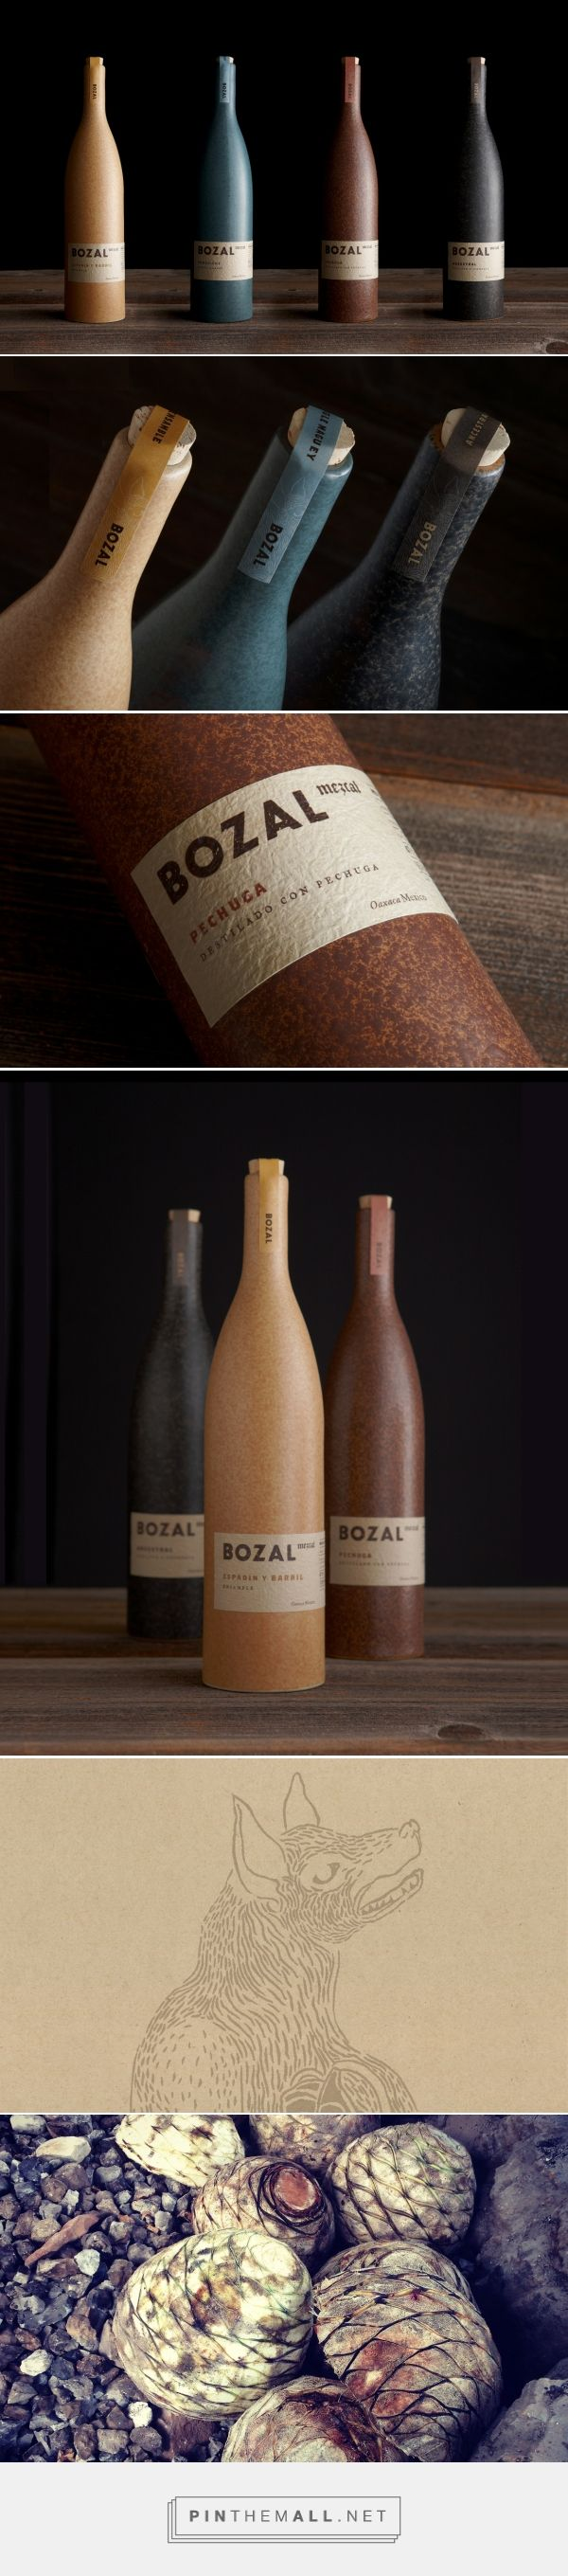 Bozal Mezcal packaging design by Swig - http://www.packagingoftheworld.com/2018/01/bozal-mezcal.html